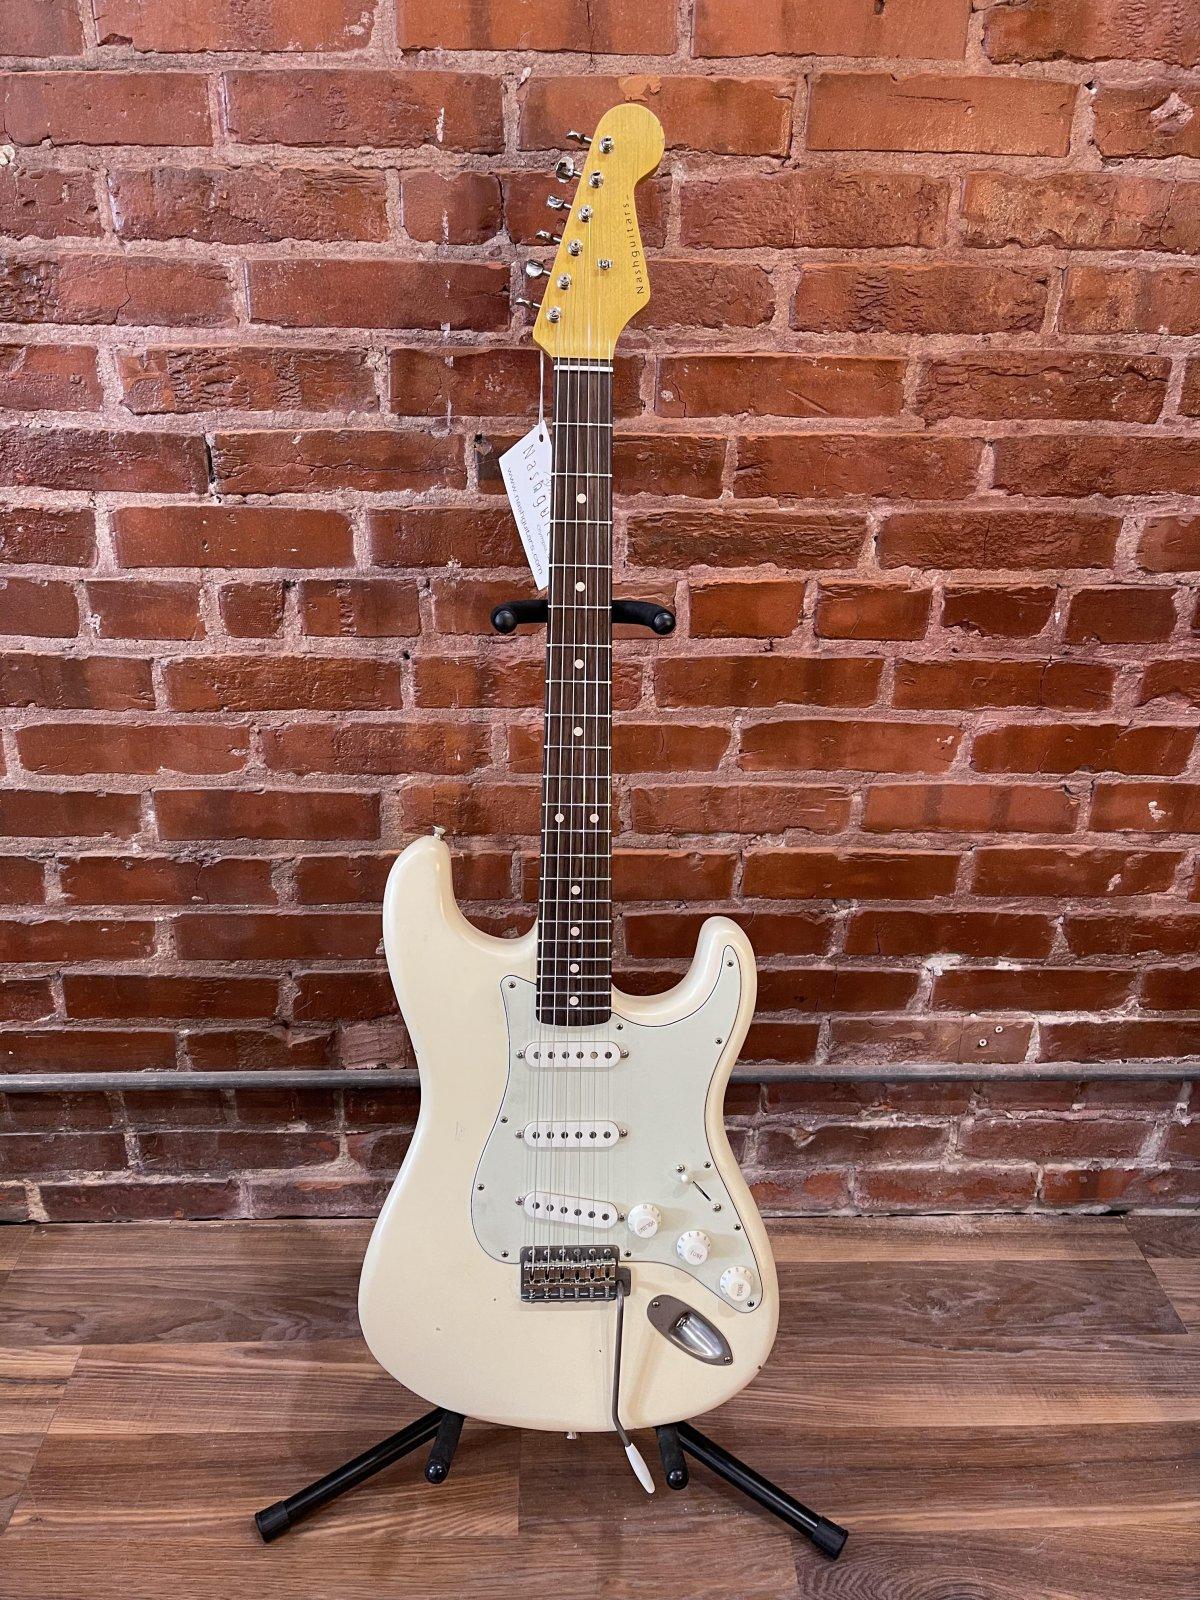 Nash Guitars S-63 Olympic White